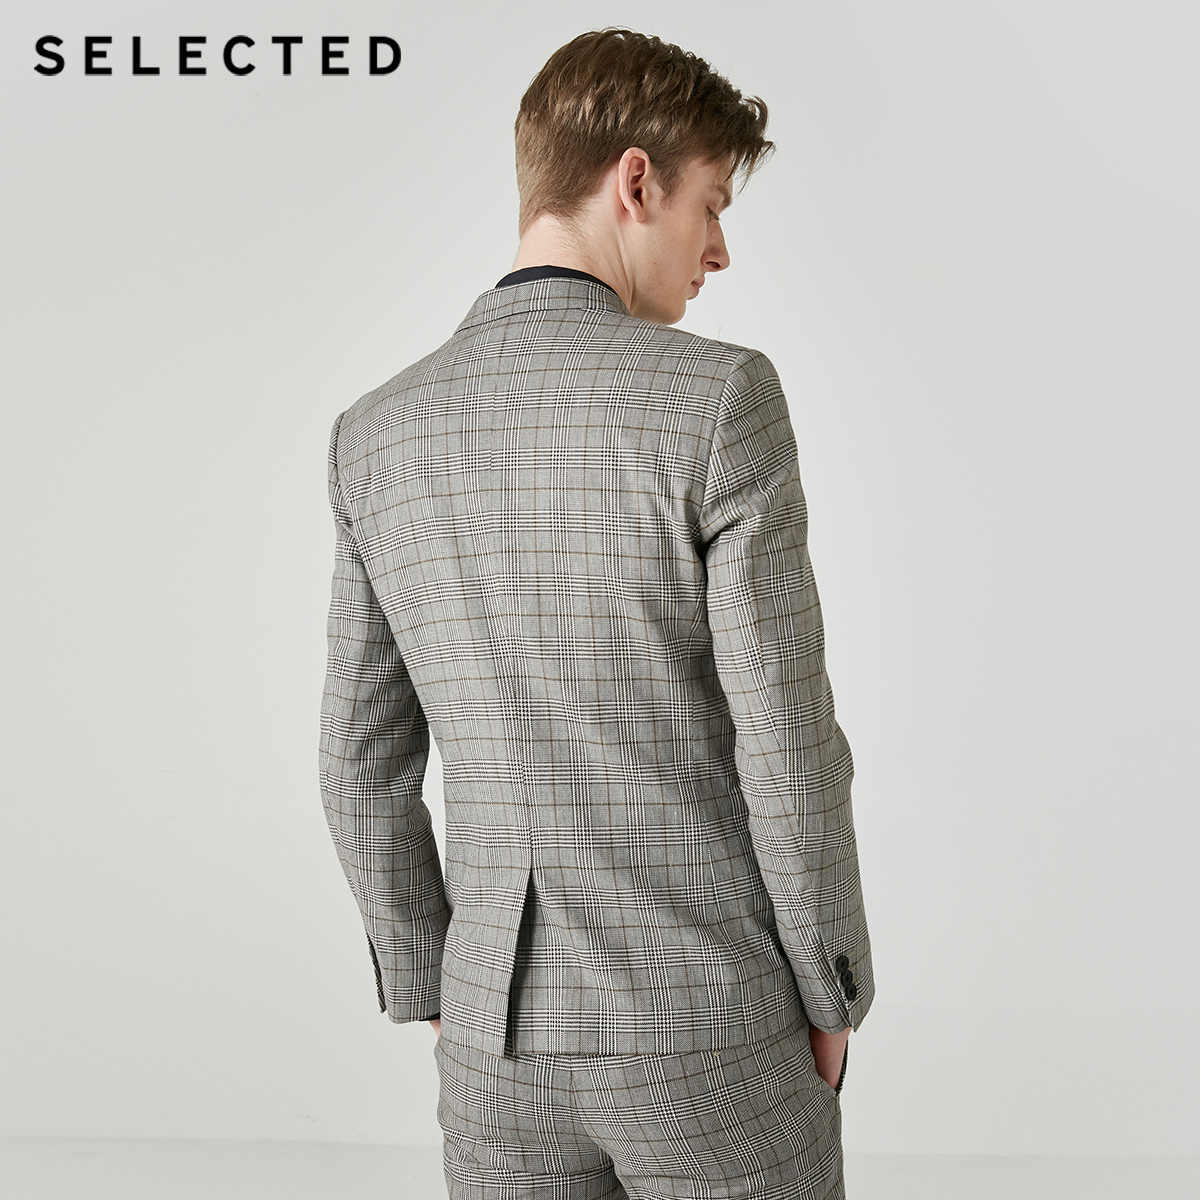 SELECTED 남성 코튼 블렌드 체크 무늬 더블 브레스트 재킷 S | 419272513